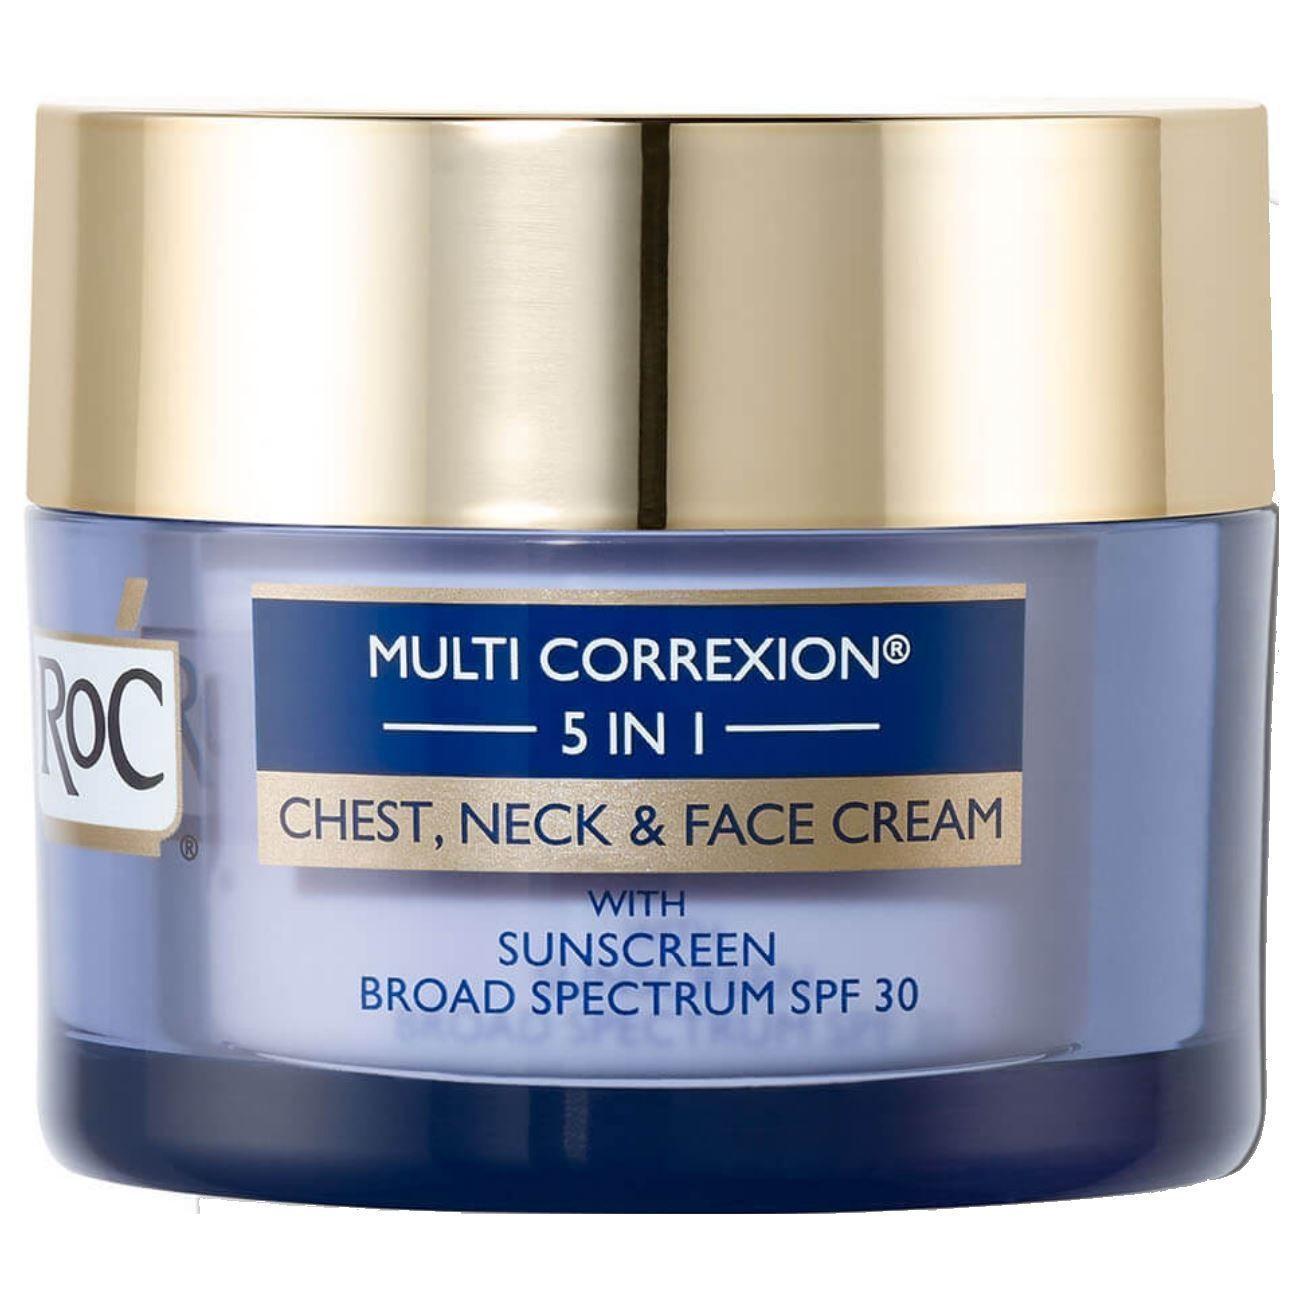 Multi-Correxion 5 in 1 Chest, Neck & Face Cream with Sunscreen SPF 30